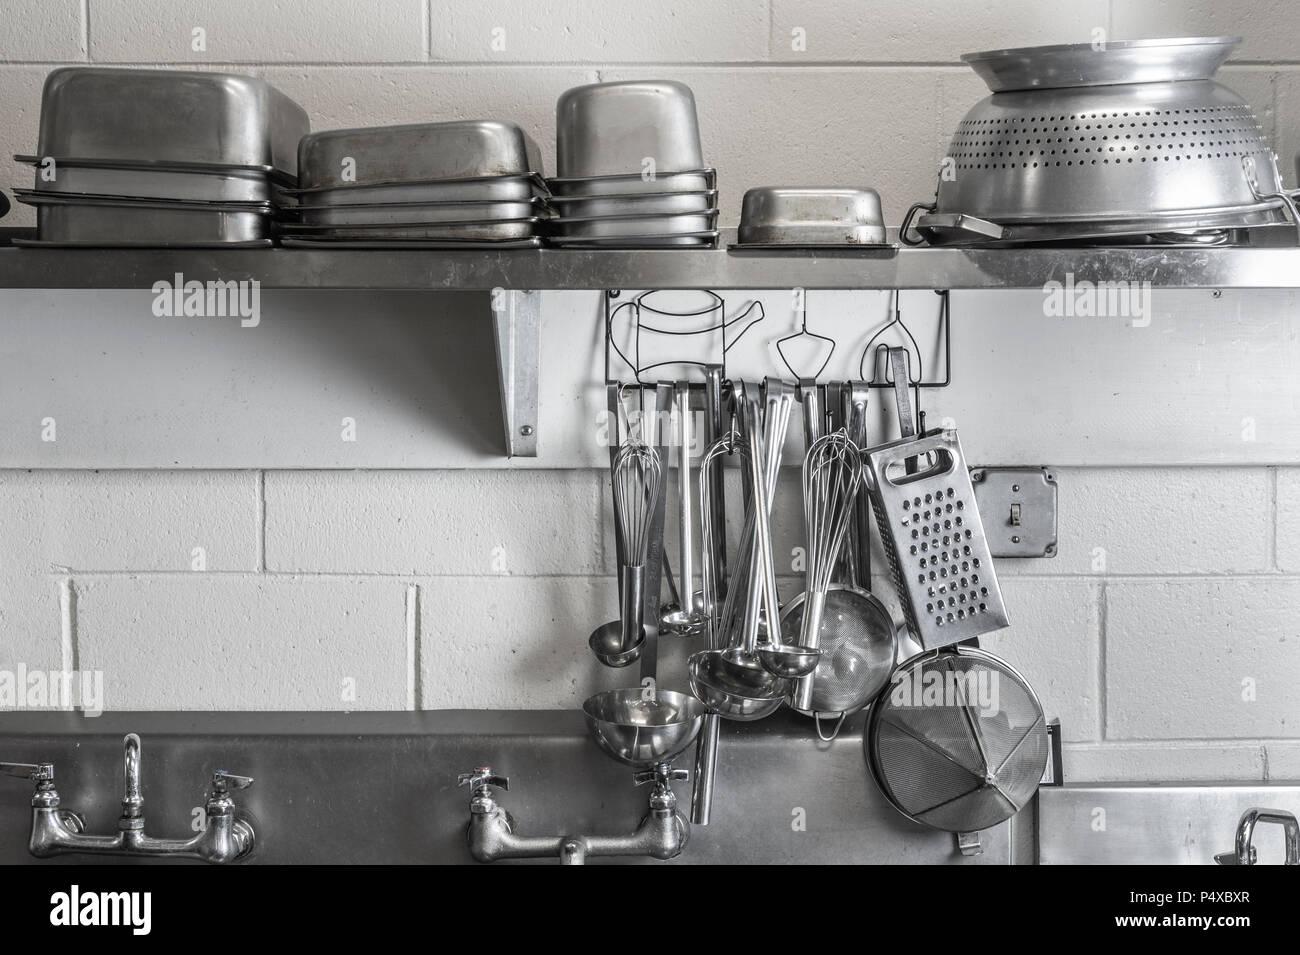 Feuille D Inox À Coller restaurant cuisine commerciale d'ustensiles de cuisine en